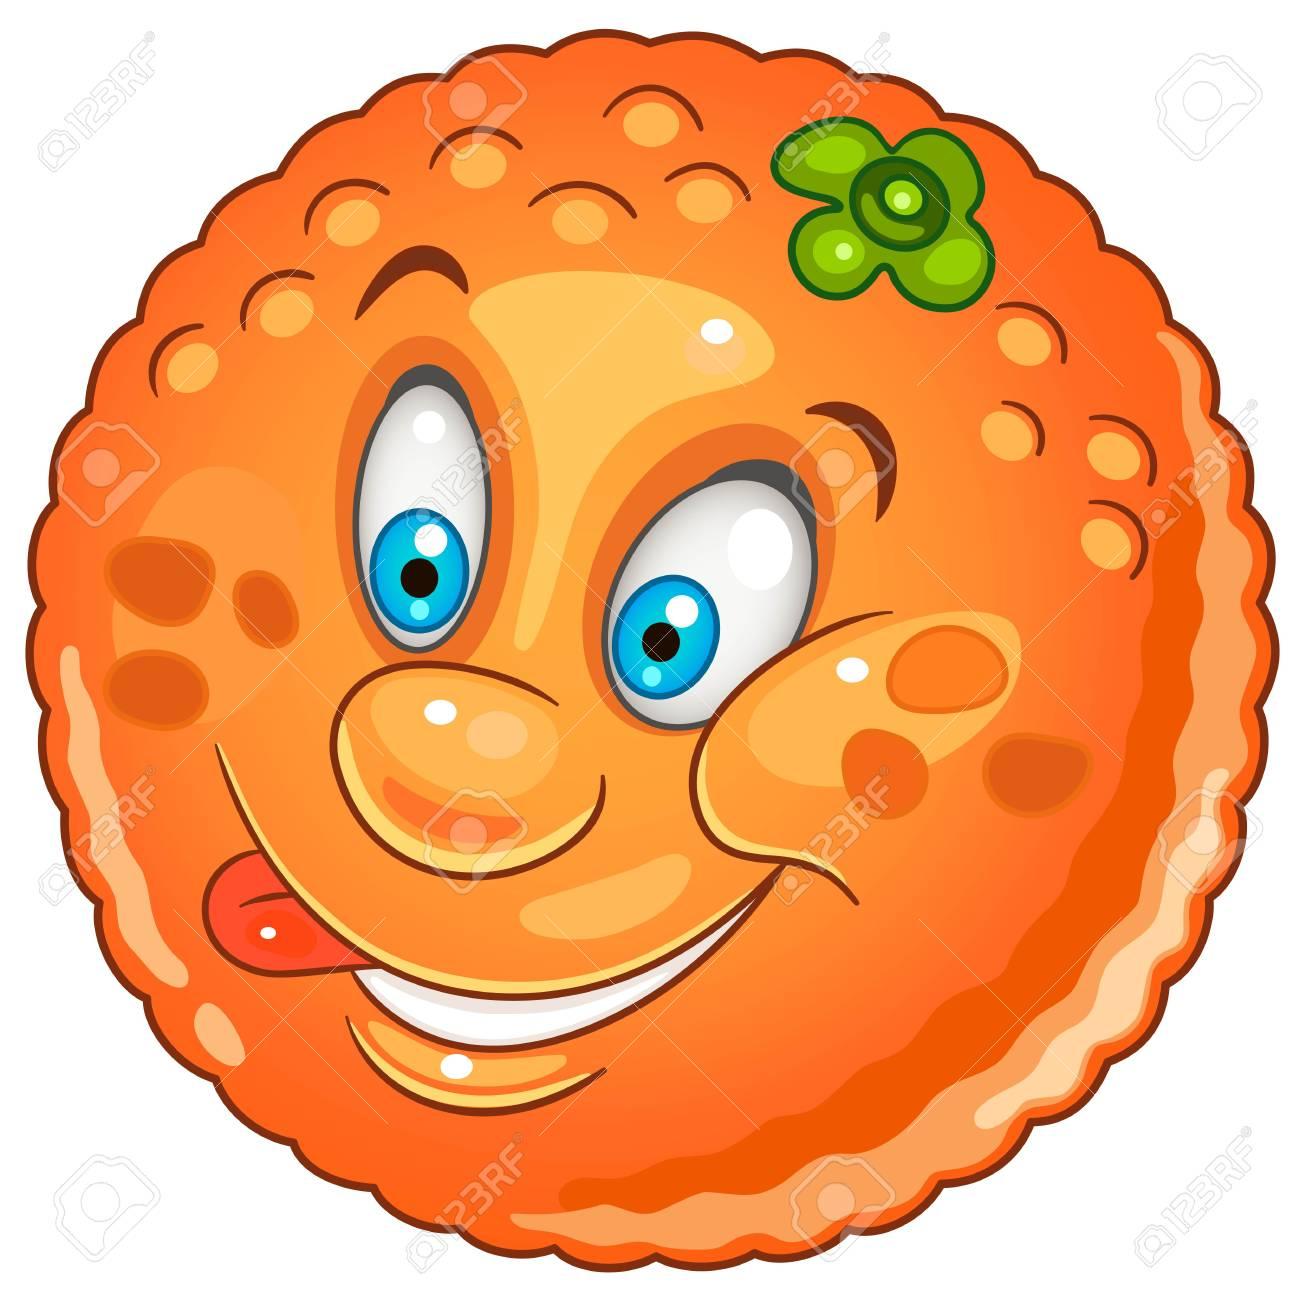 Dibujos Animados Icono De Cítricos Naranja Carácter De Frutas Para